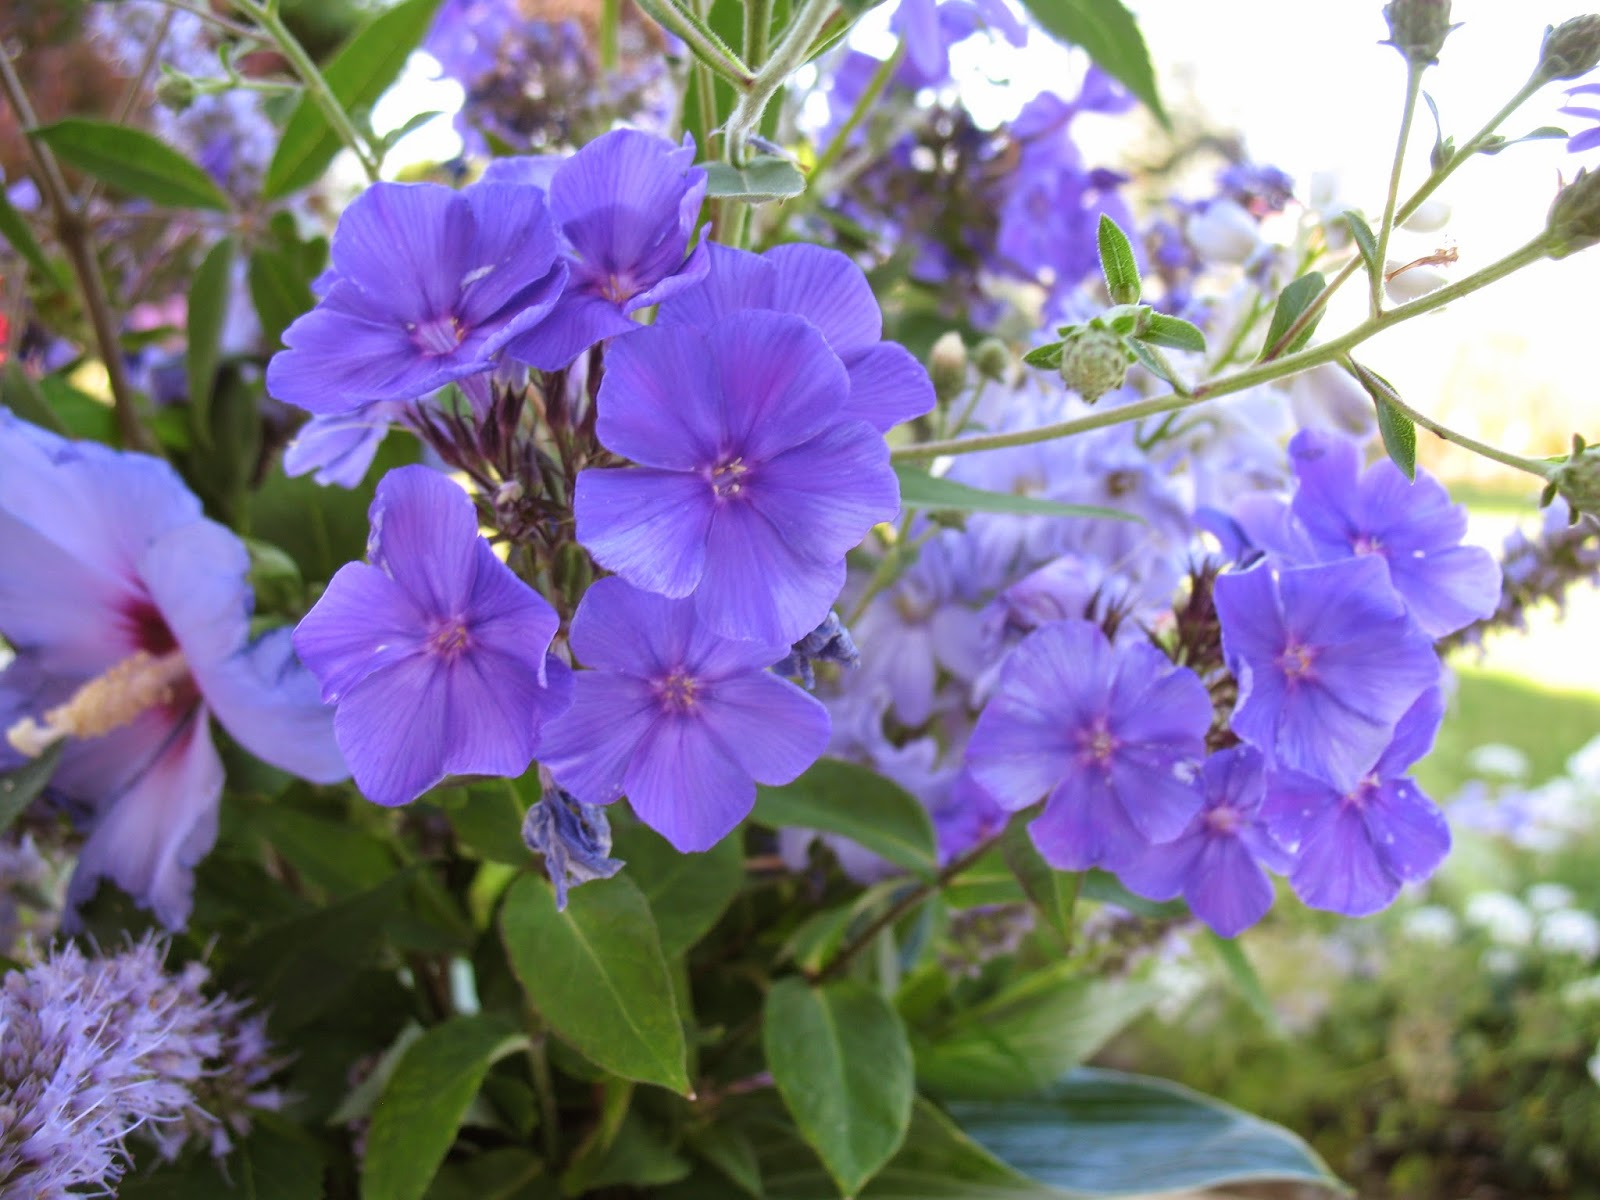 roses du jardin ch neland fleurs bleues estivales. Black Bedroom Furniture Sets. Home Design Ideas